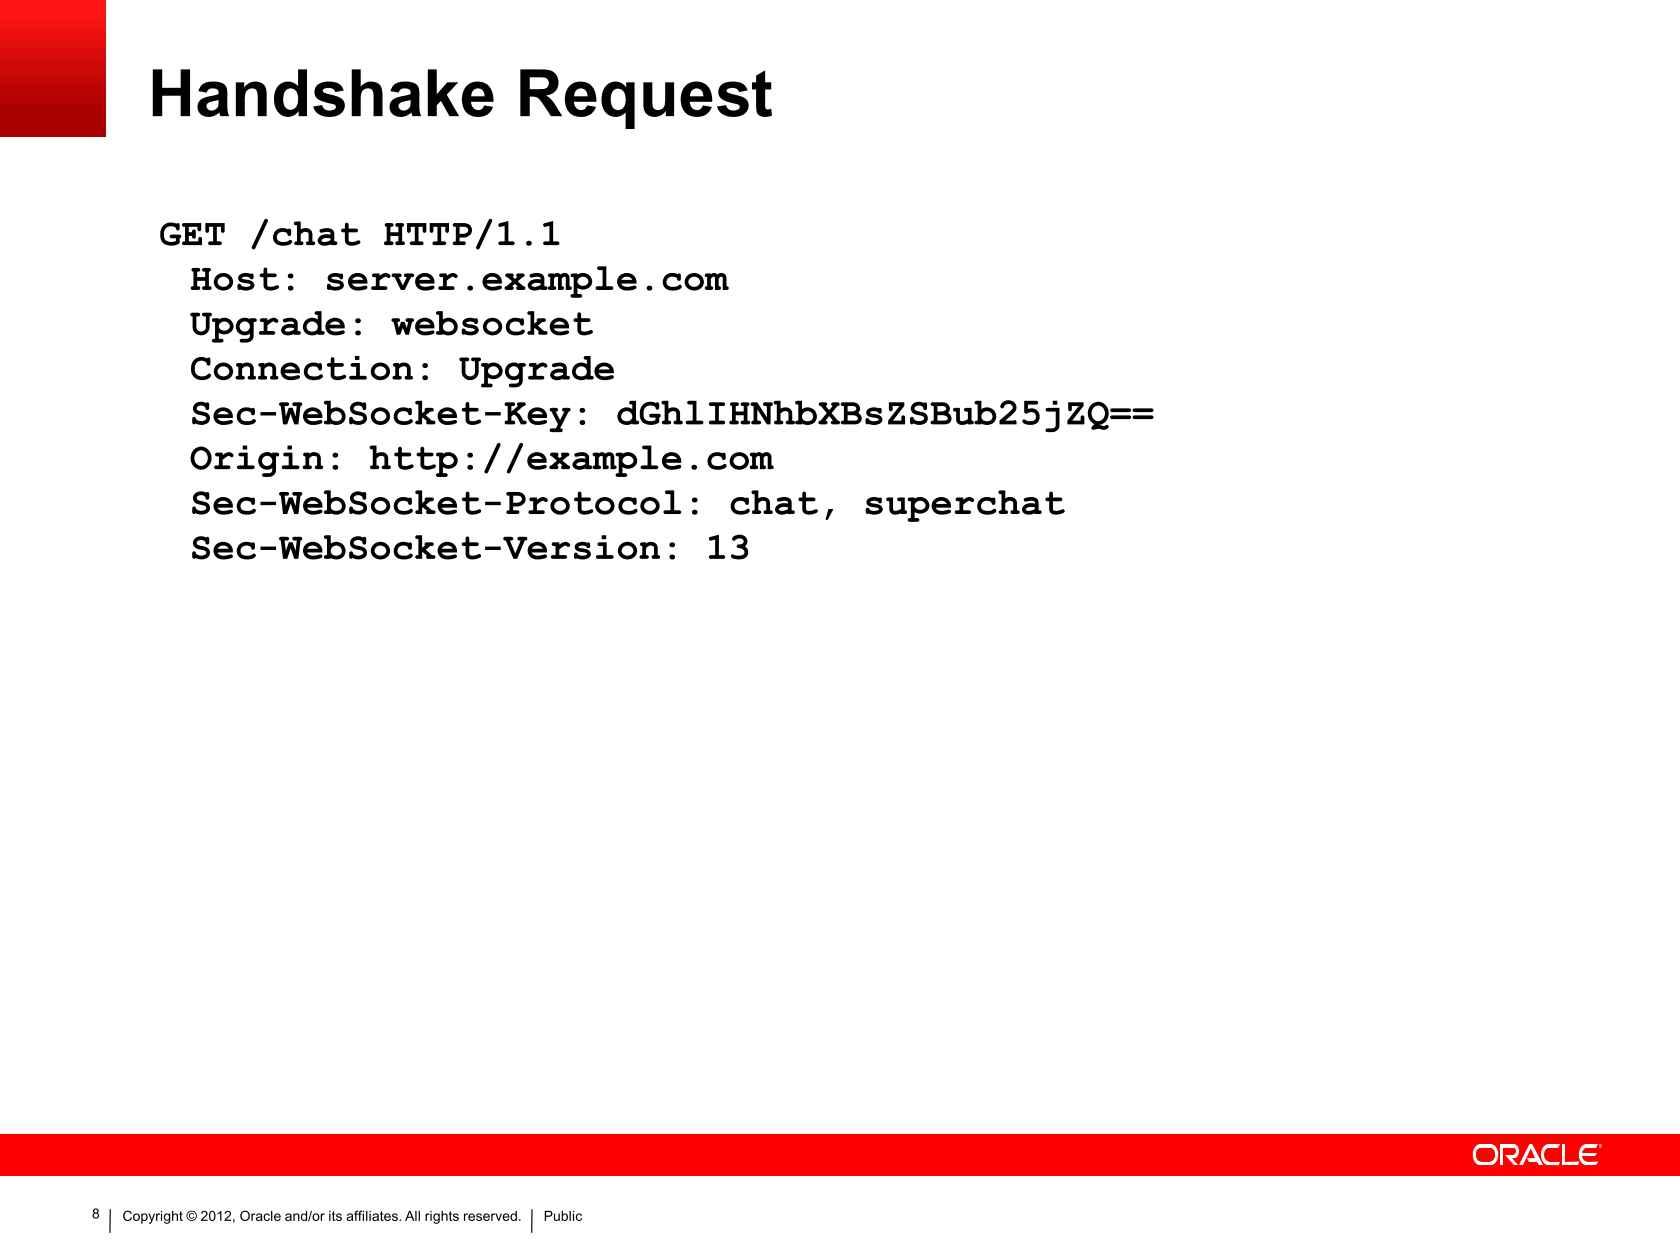 Building Java HTML5/WebSocket Applications with JSR 356